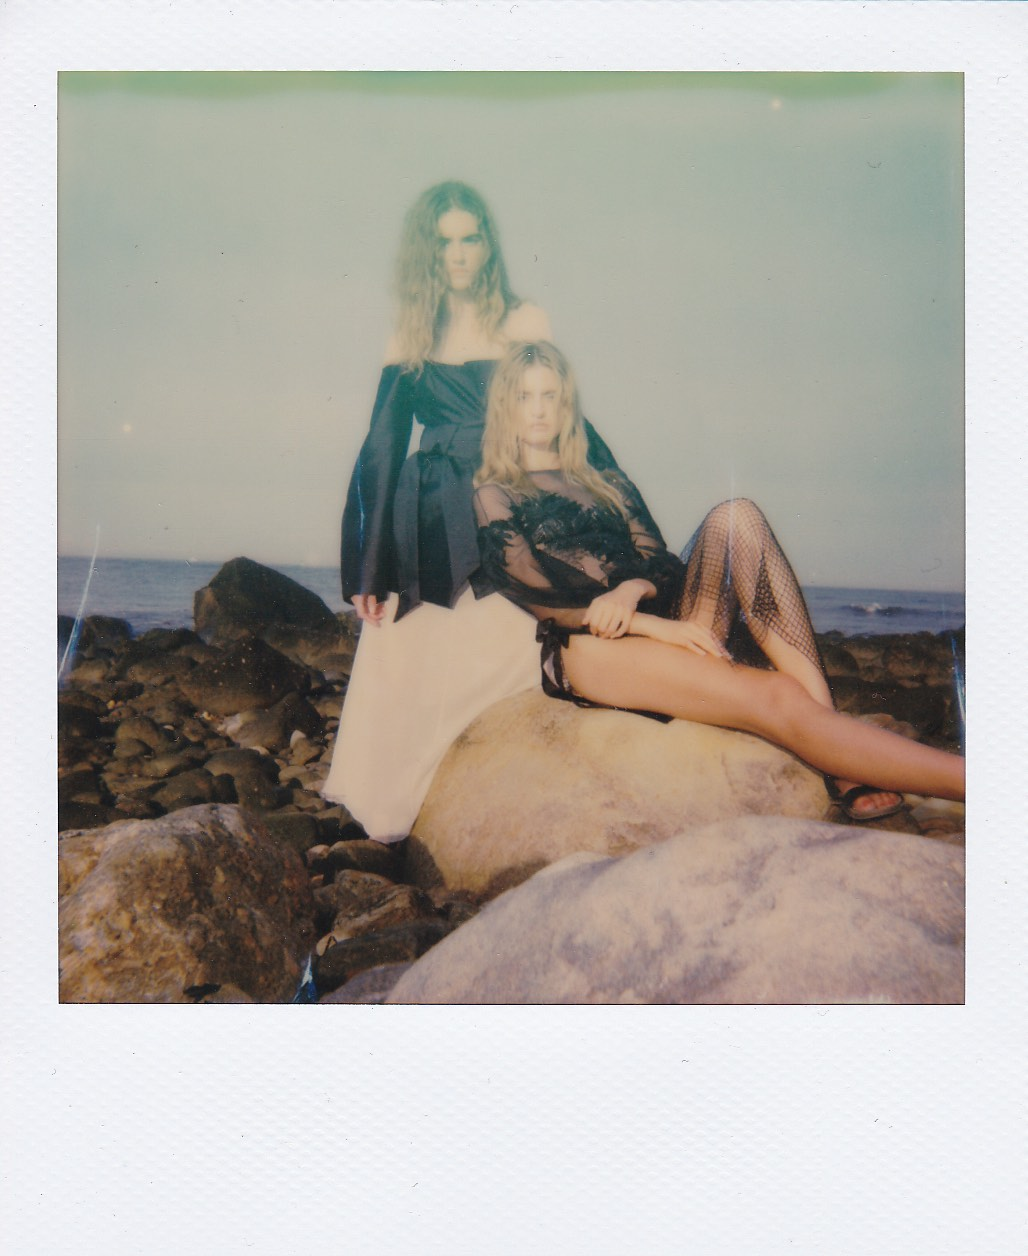 Fashion Polaroid by Fiona y Eduardo